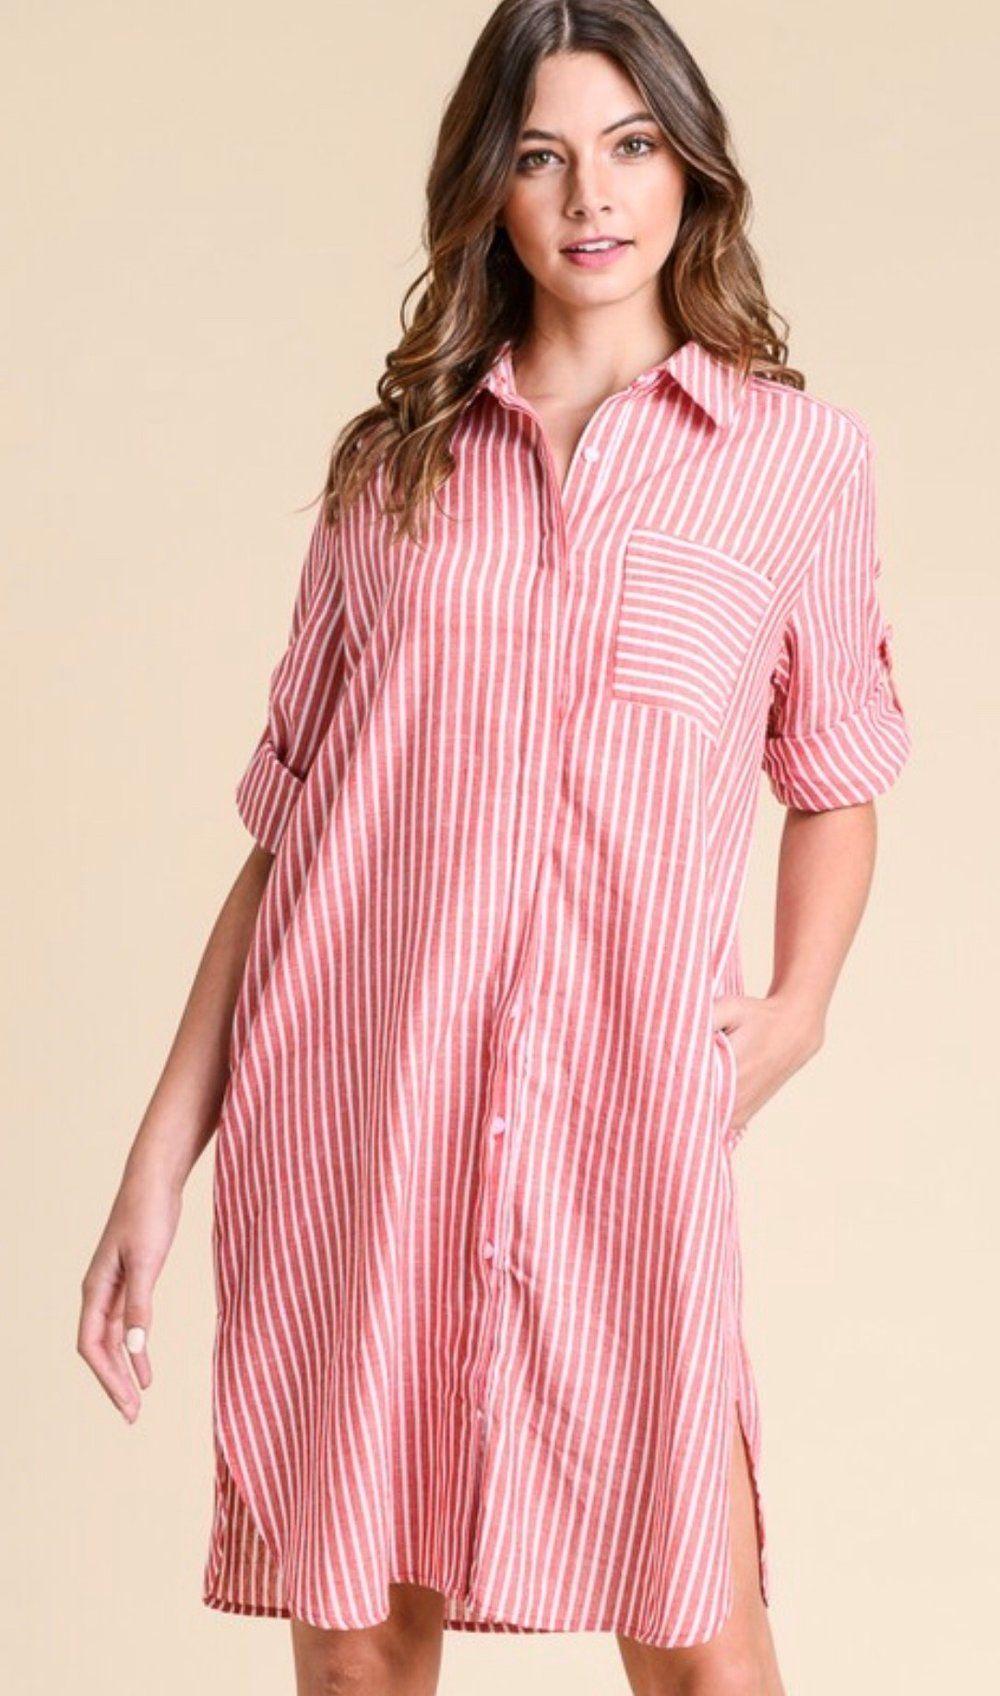 8282ade4e81597 Pamela Stripped Dress Stripped Button Up Mini Dress with slight slits on  the sides